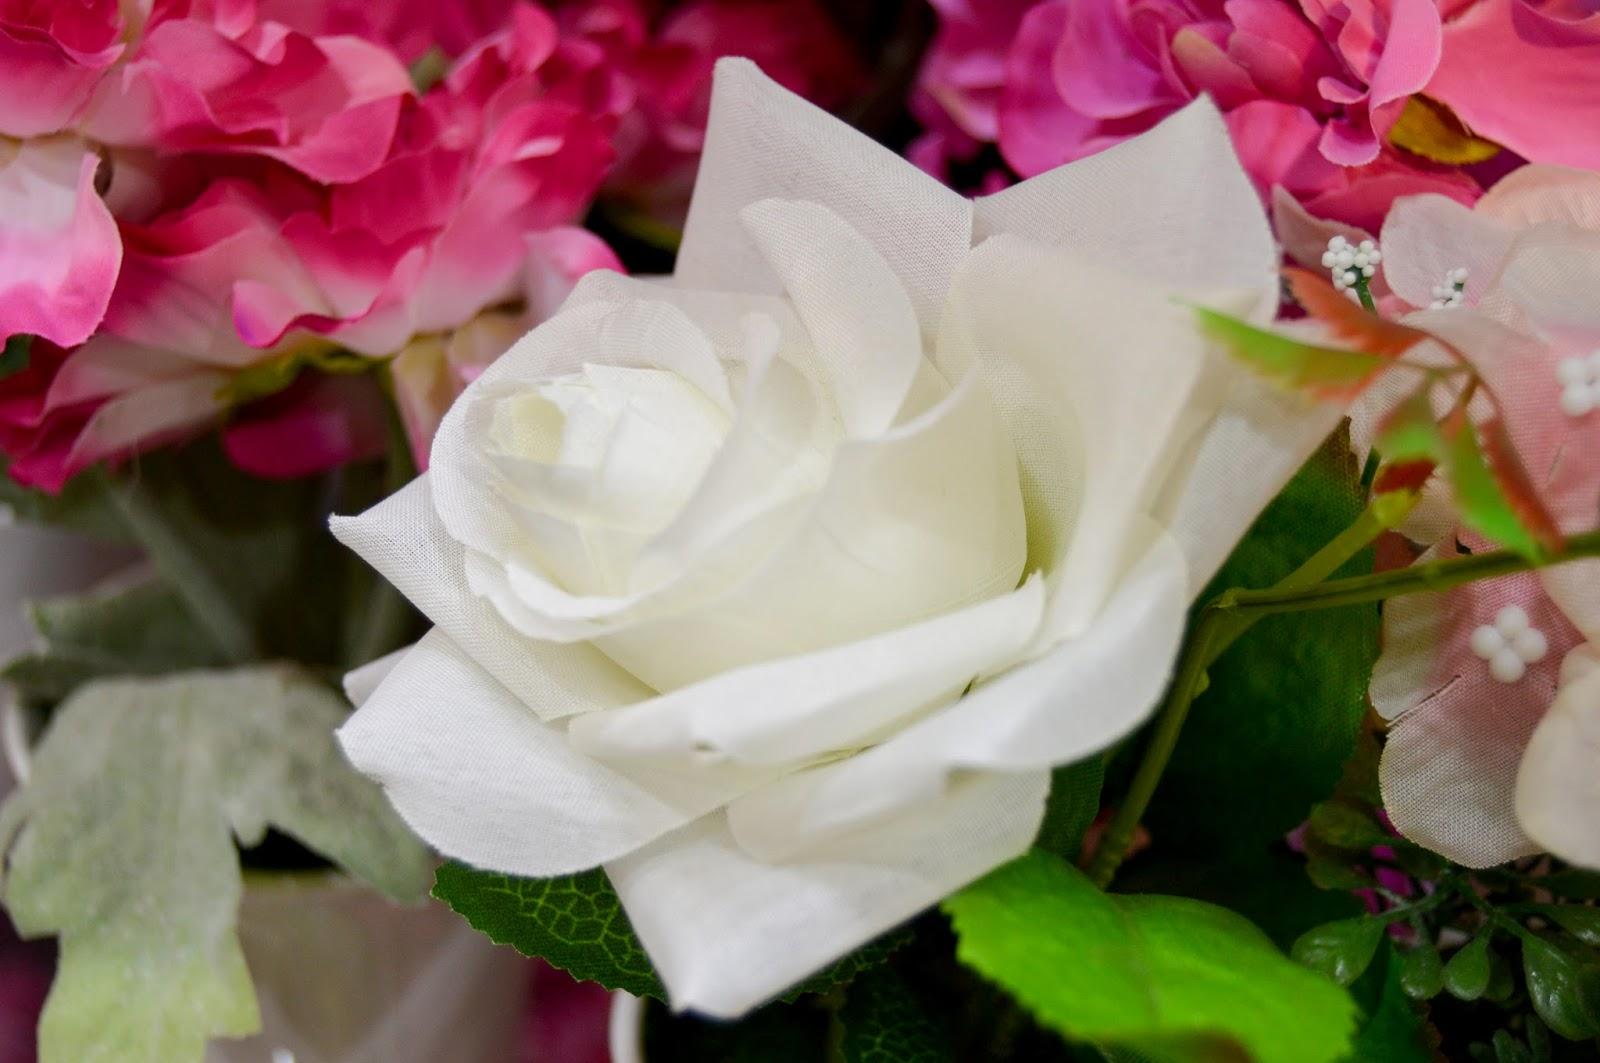 Free White Flower stock photos & wallpapers